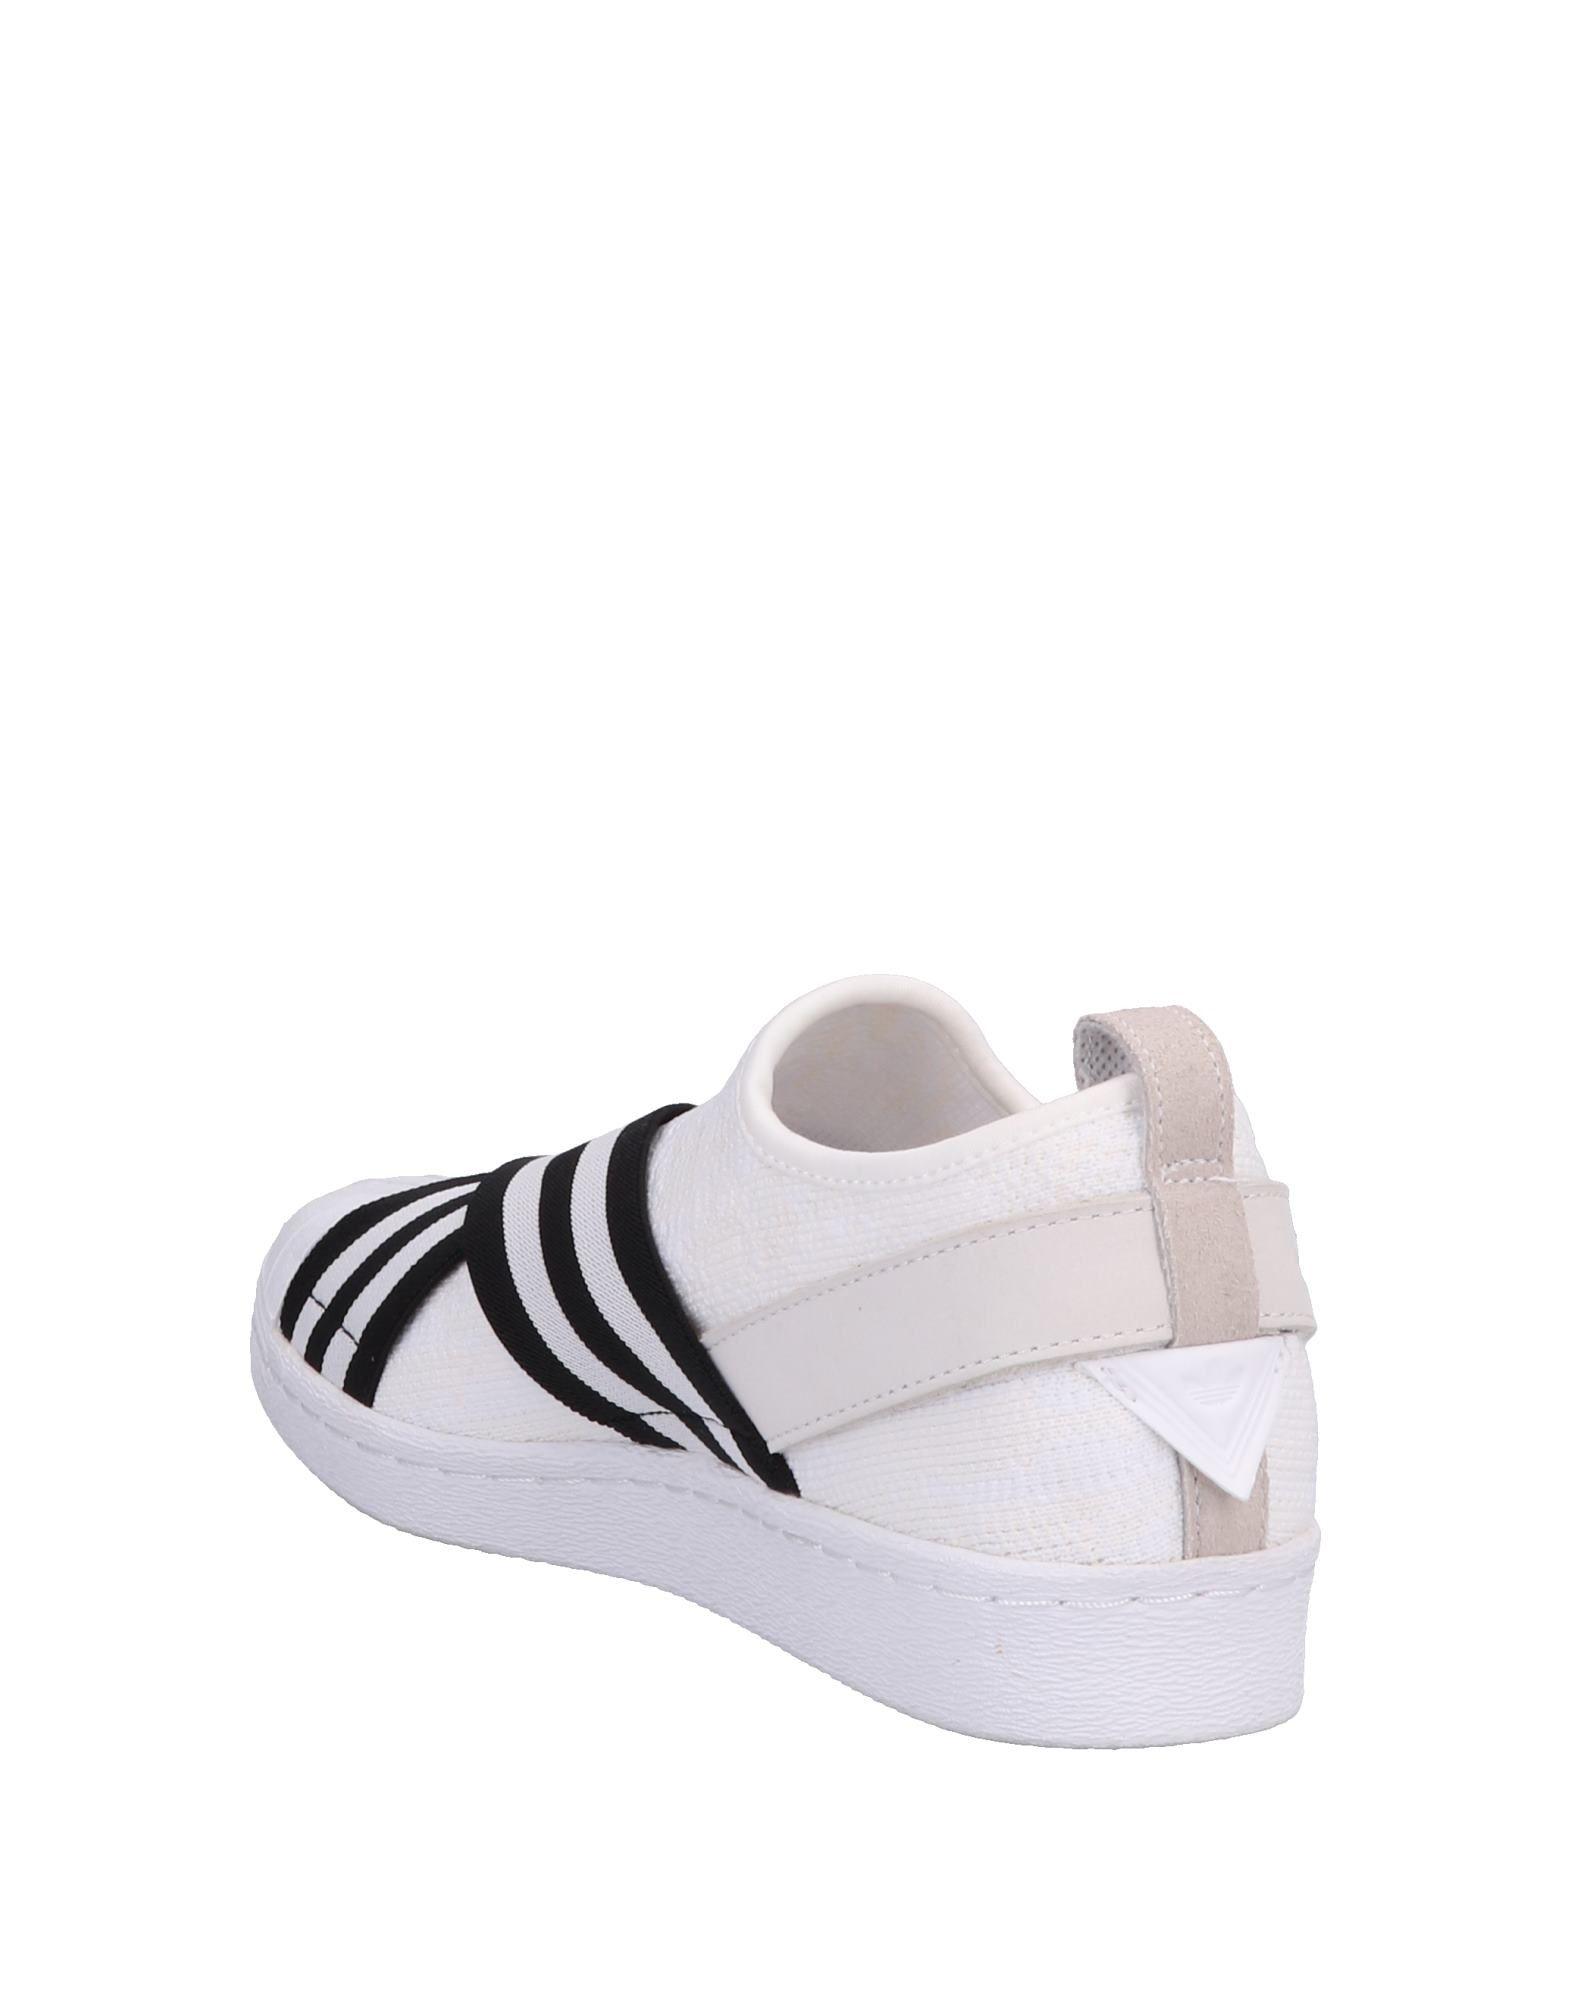 Adidas Originals Sneakers - Men Adidas Originals Originals Originals Sneakers online on  Canada - 11566824RN e9315f